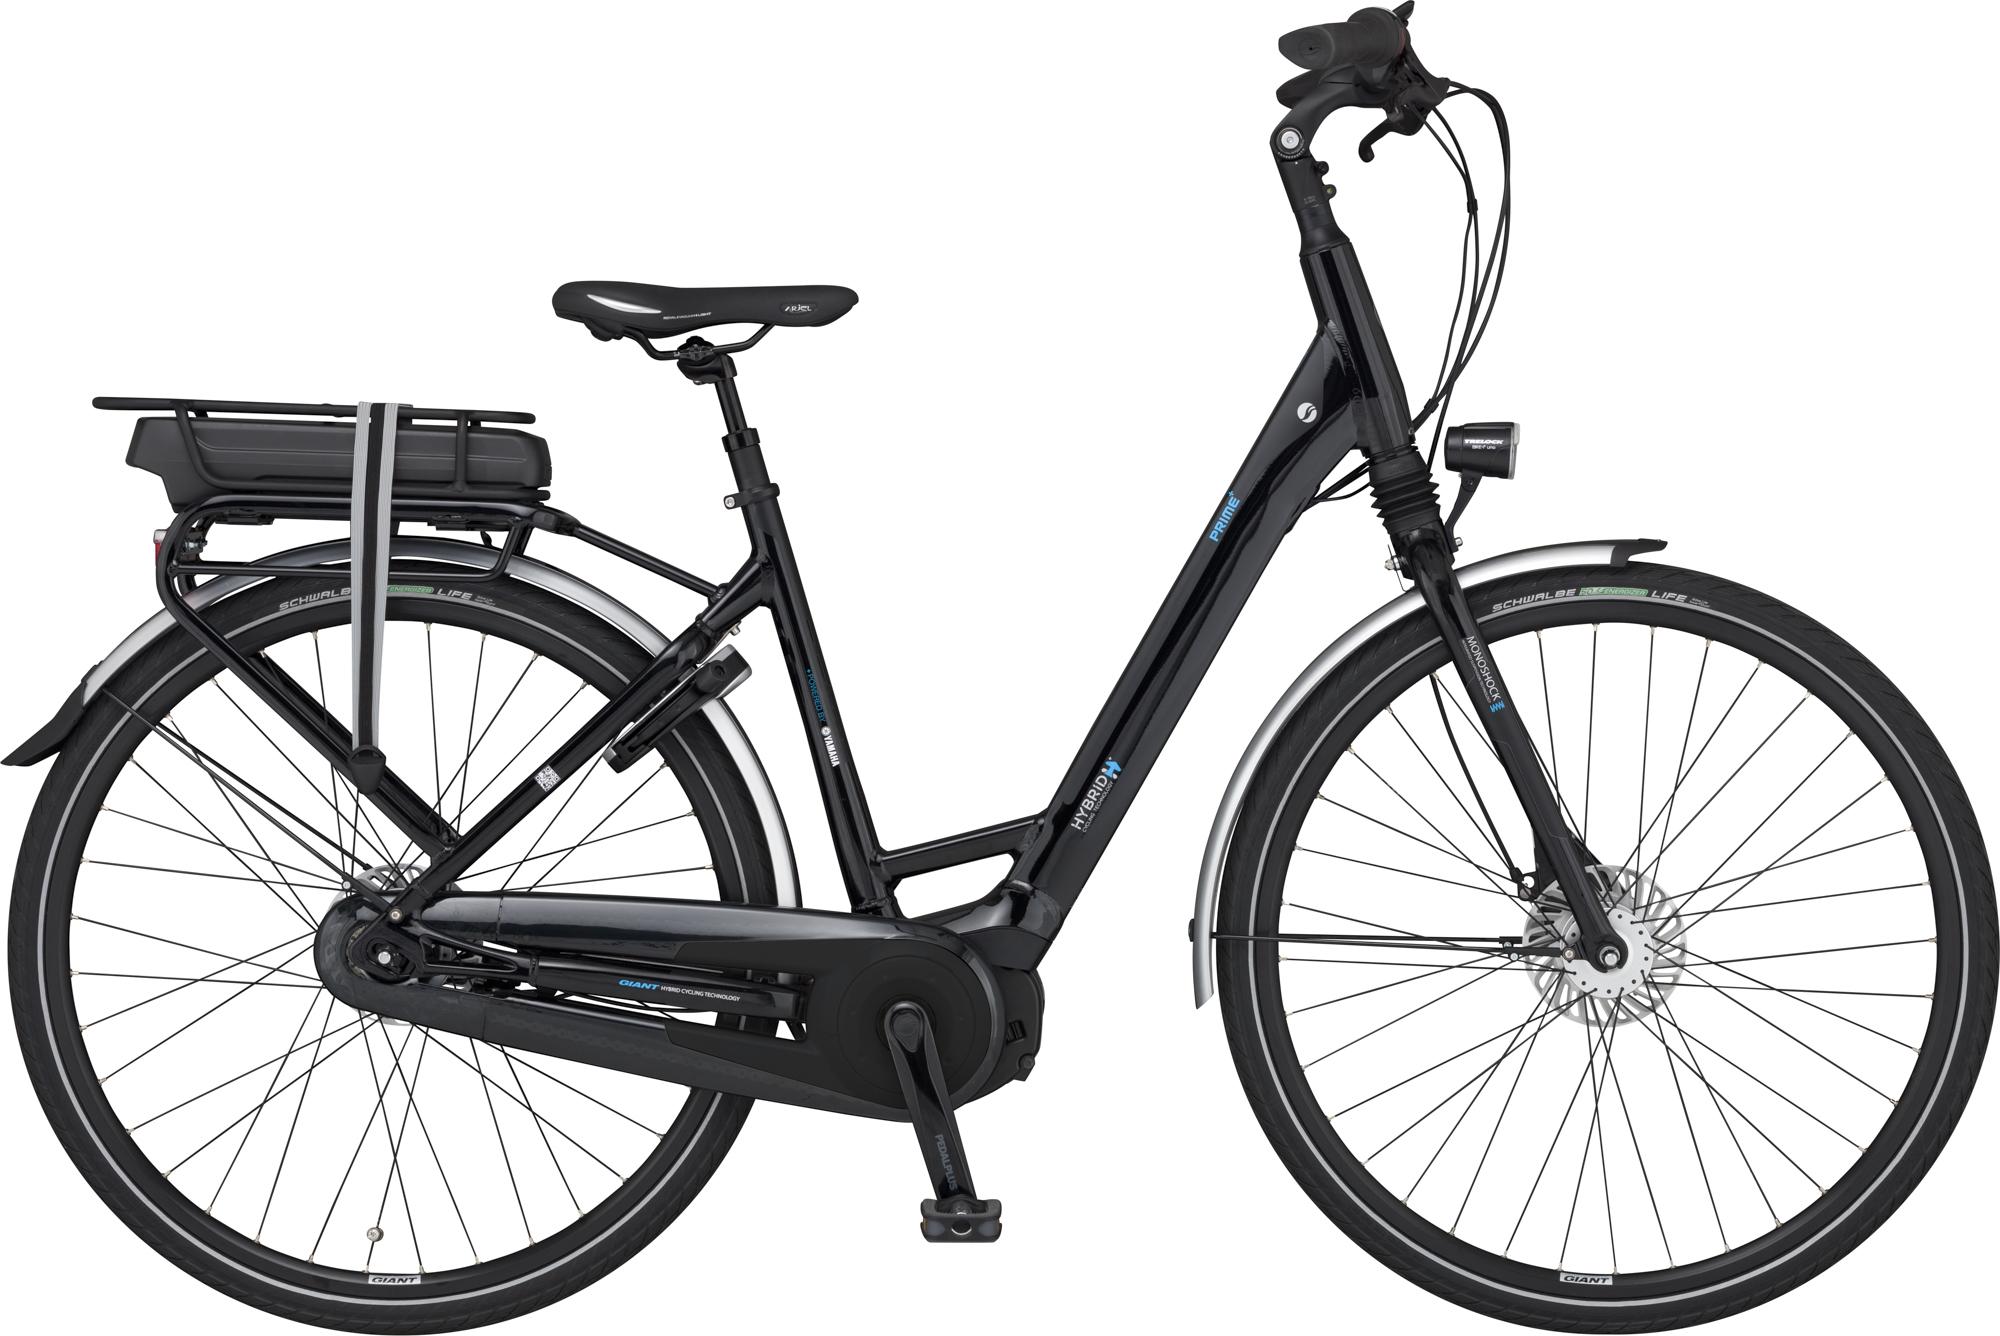 showcase prime e giant fietsen ride life ride giant. Black Bedroom Furniture Sets. Home Design Ideas